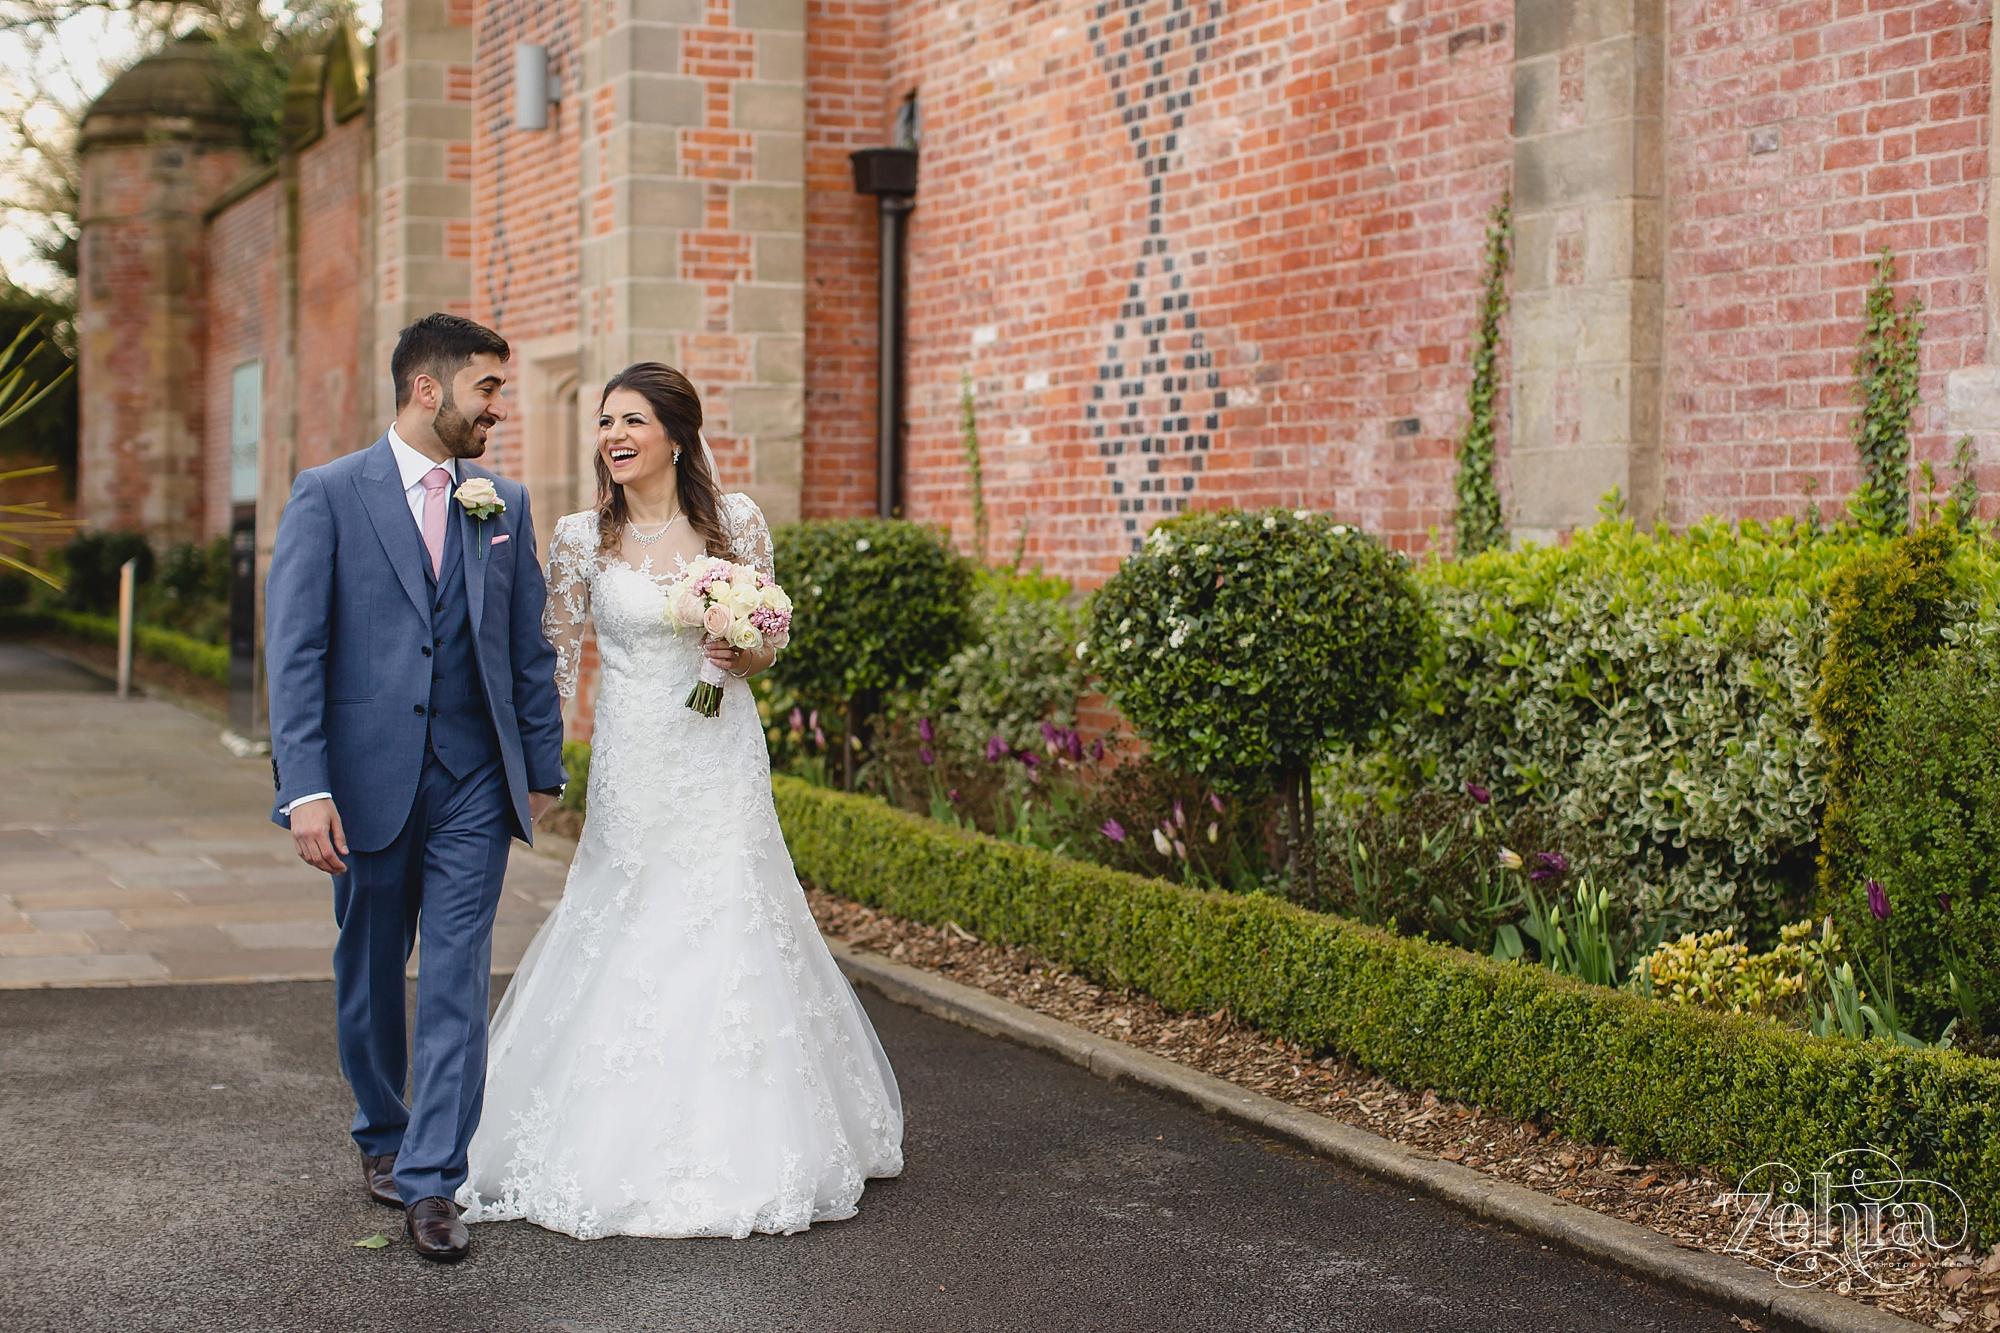 zehra photographer mere cheshire wedding_0022.jpg